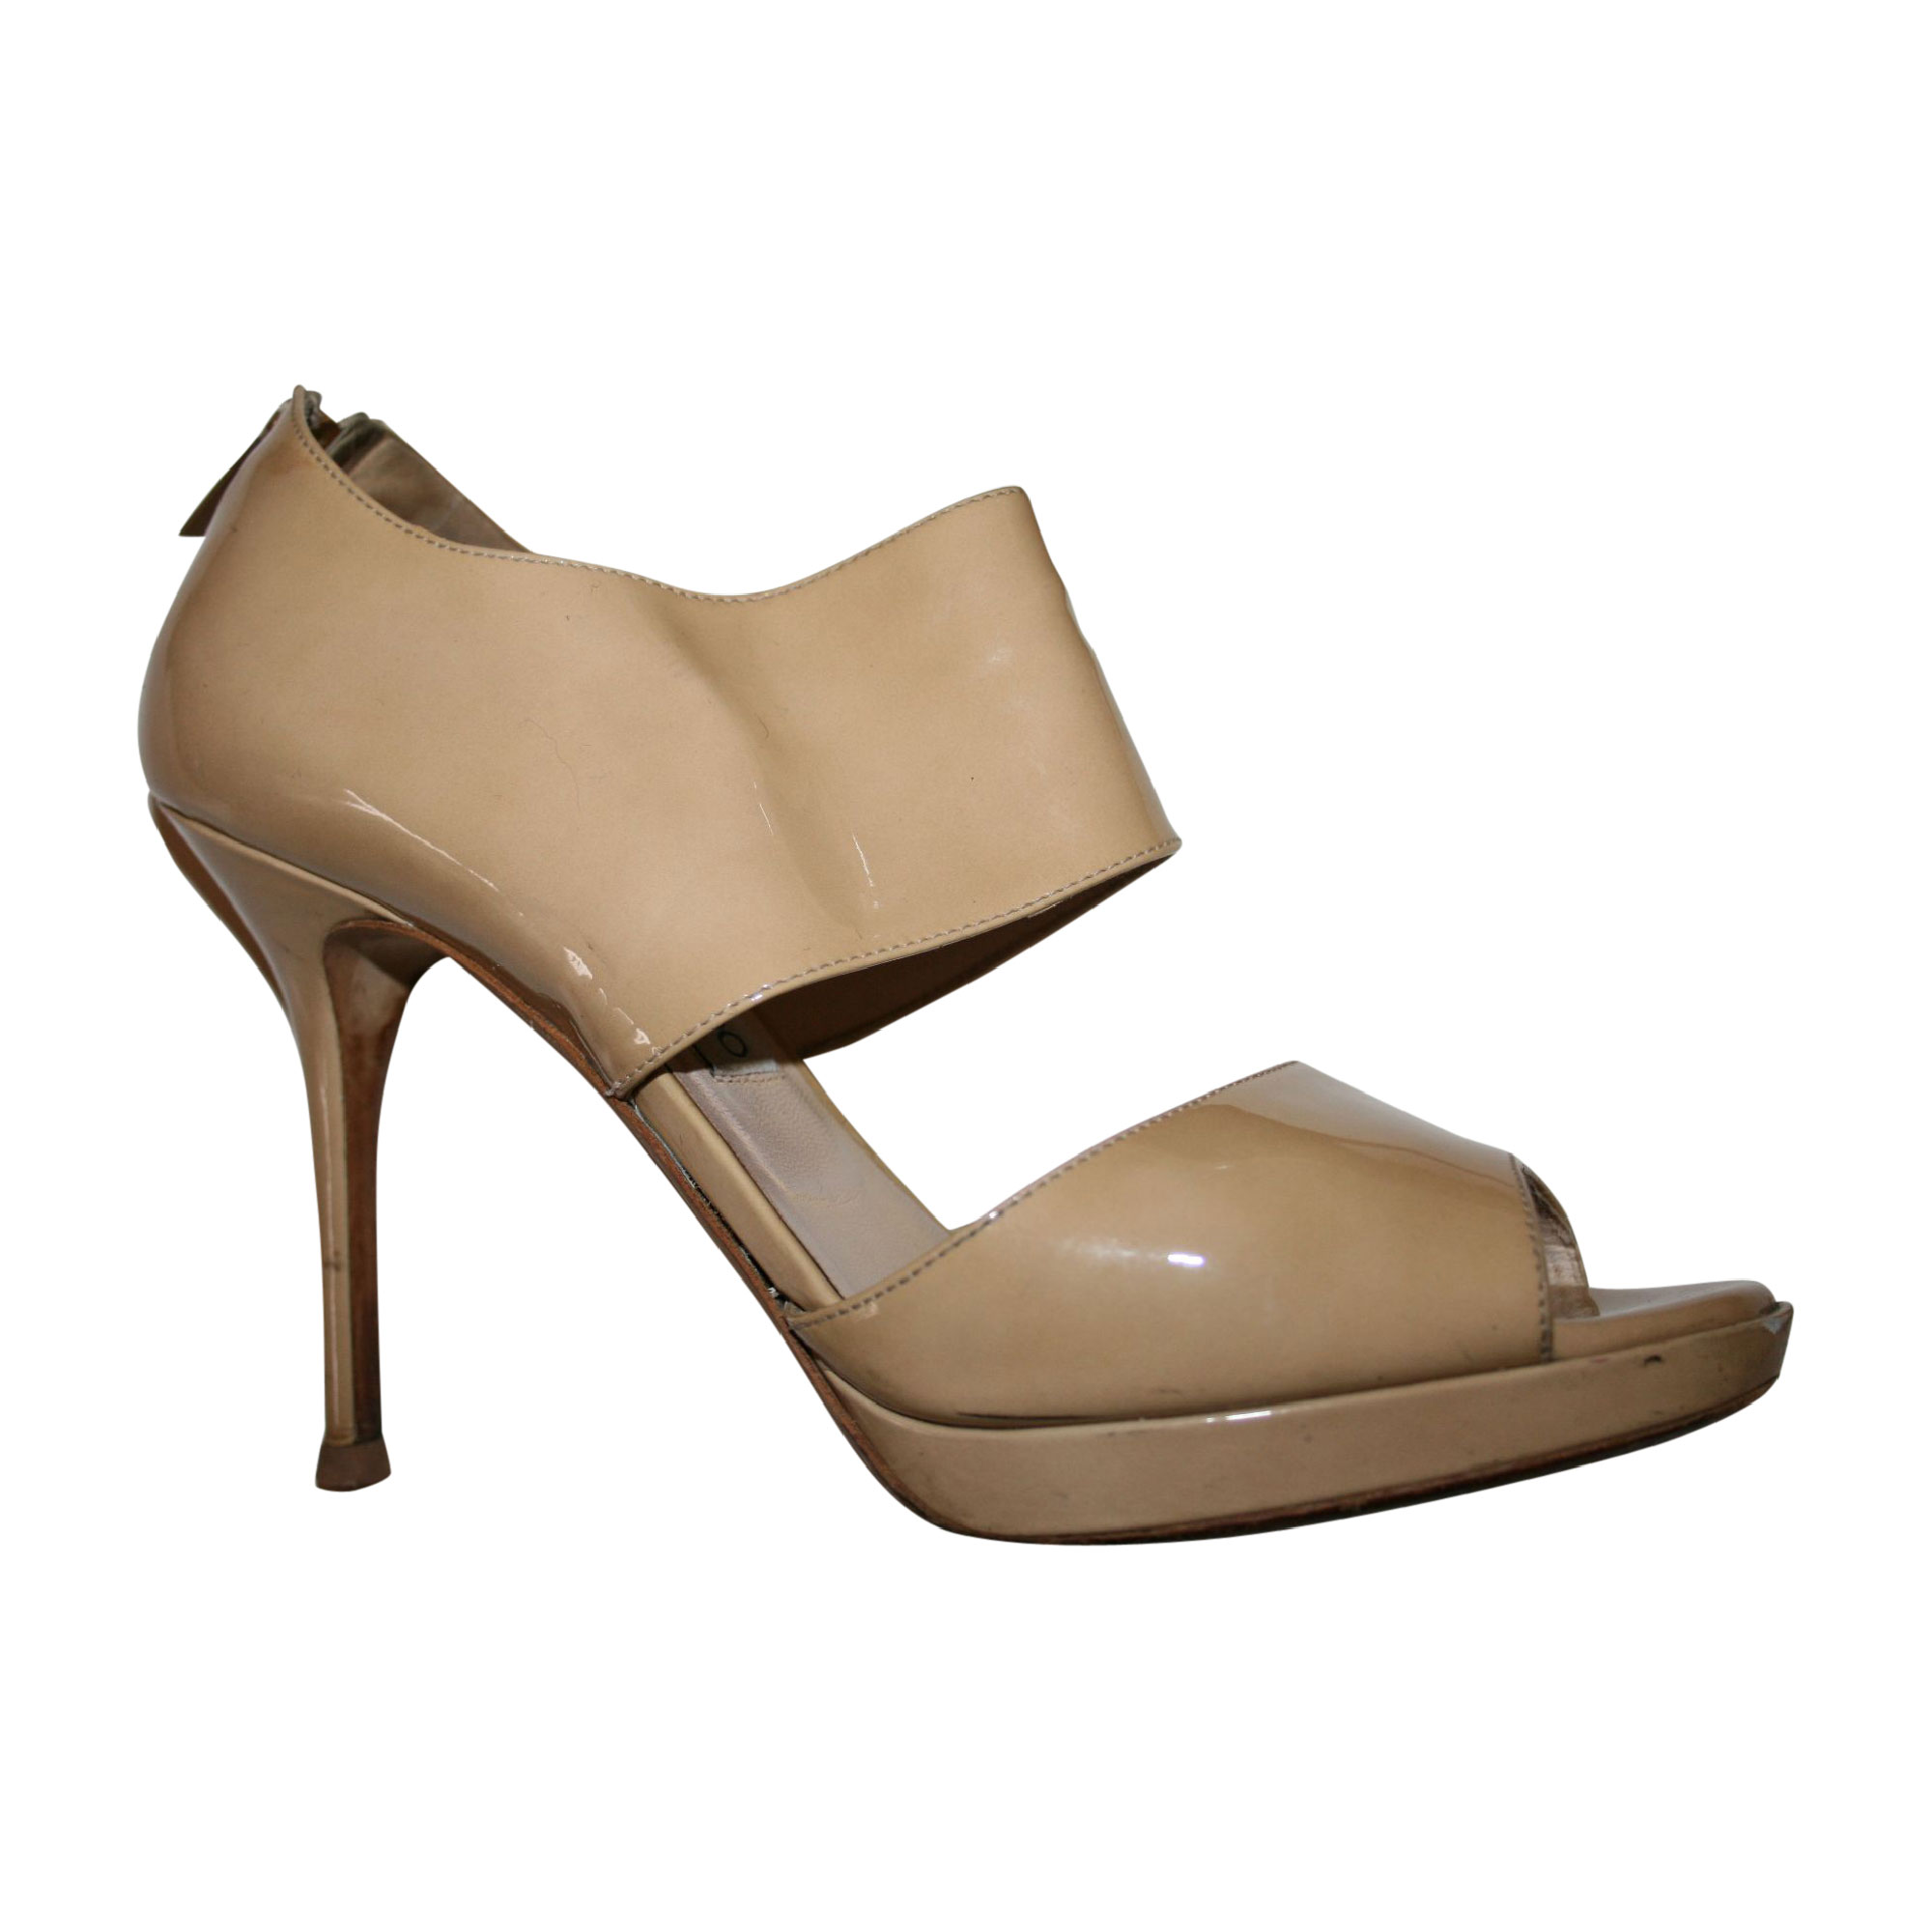 Sandales à talons JIMMY CHOO Beige, camel